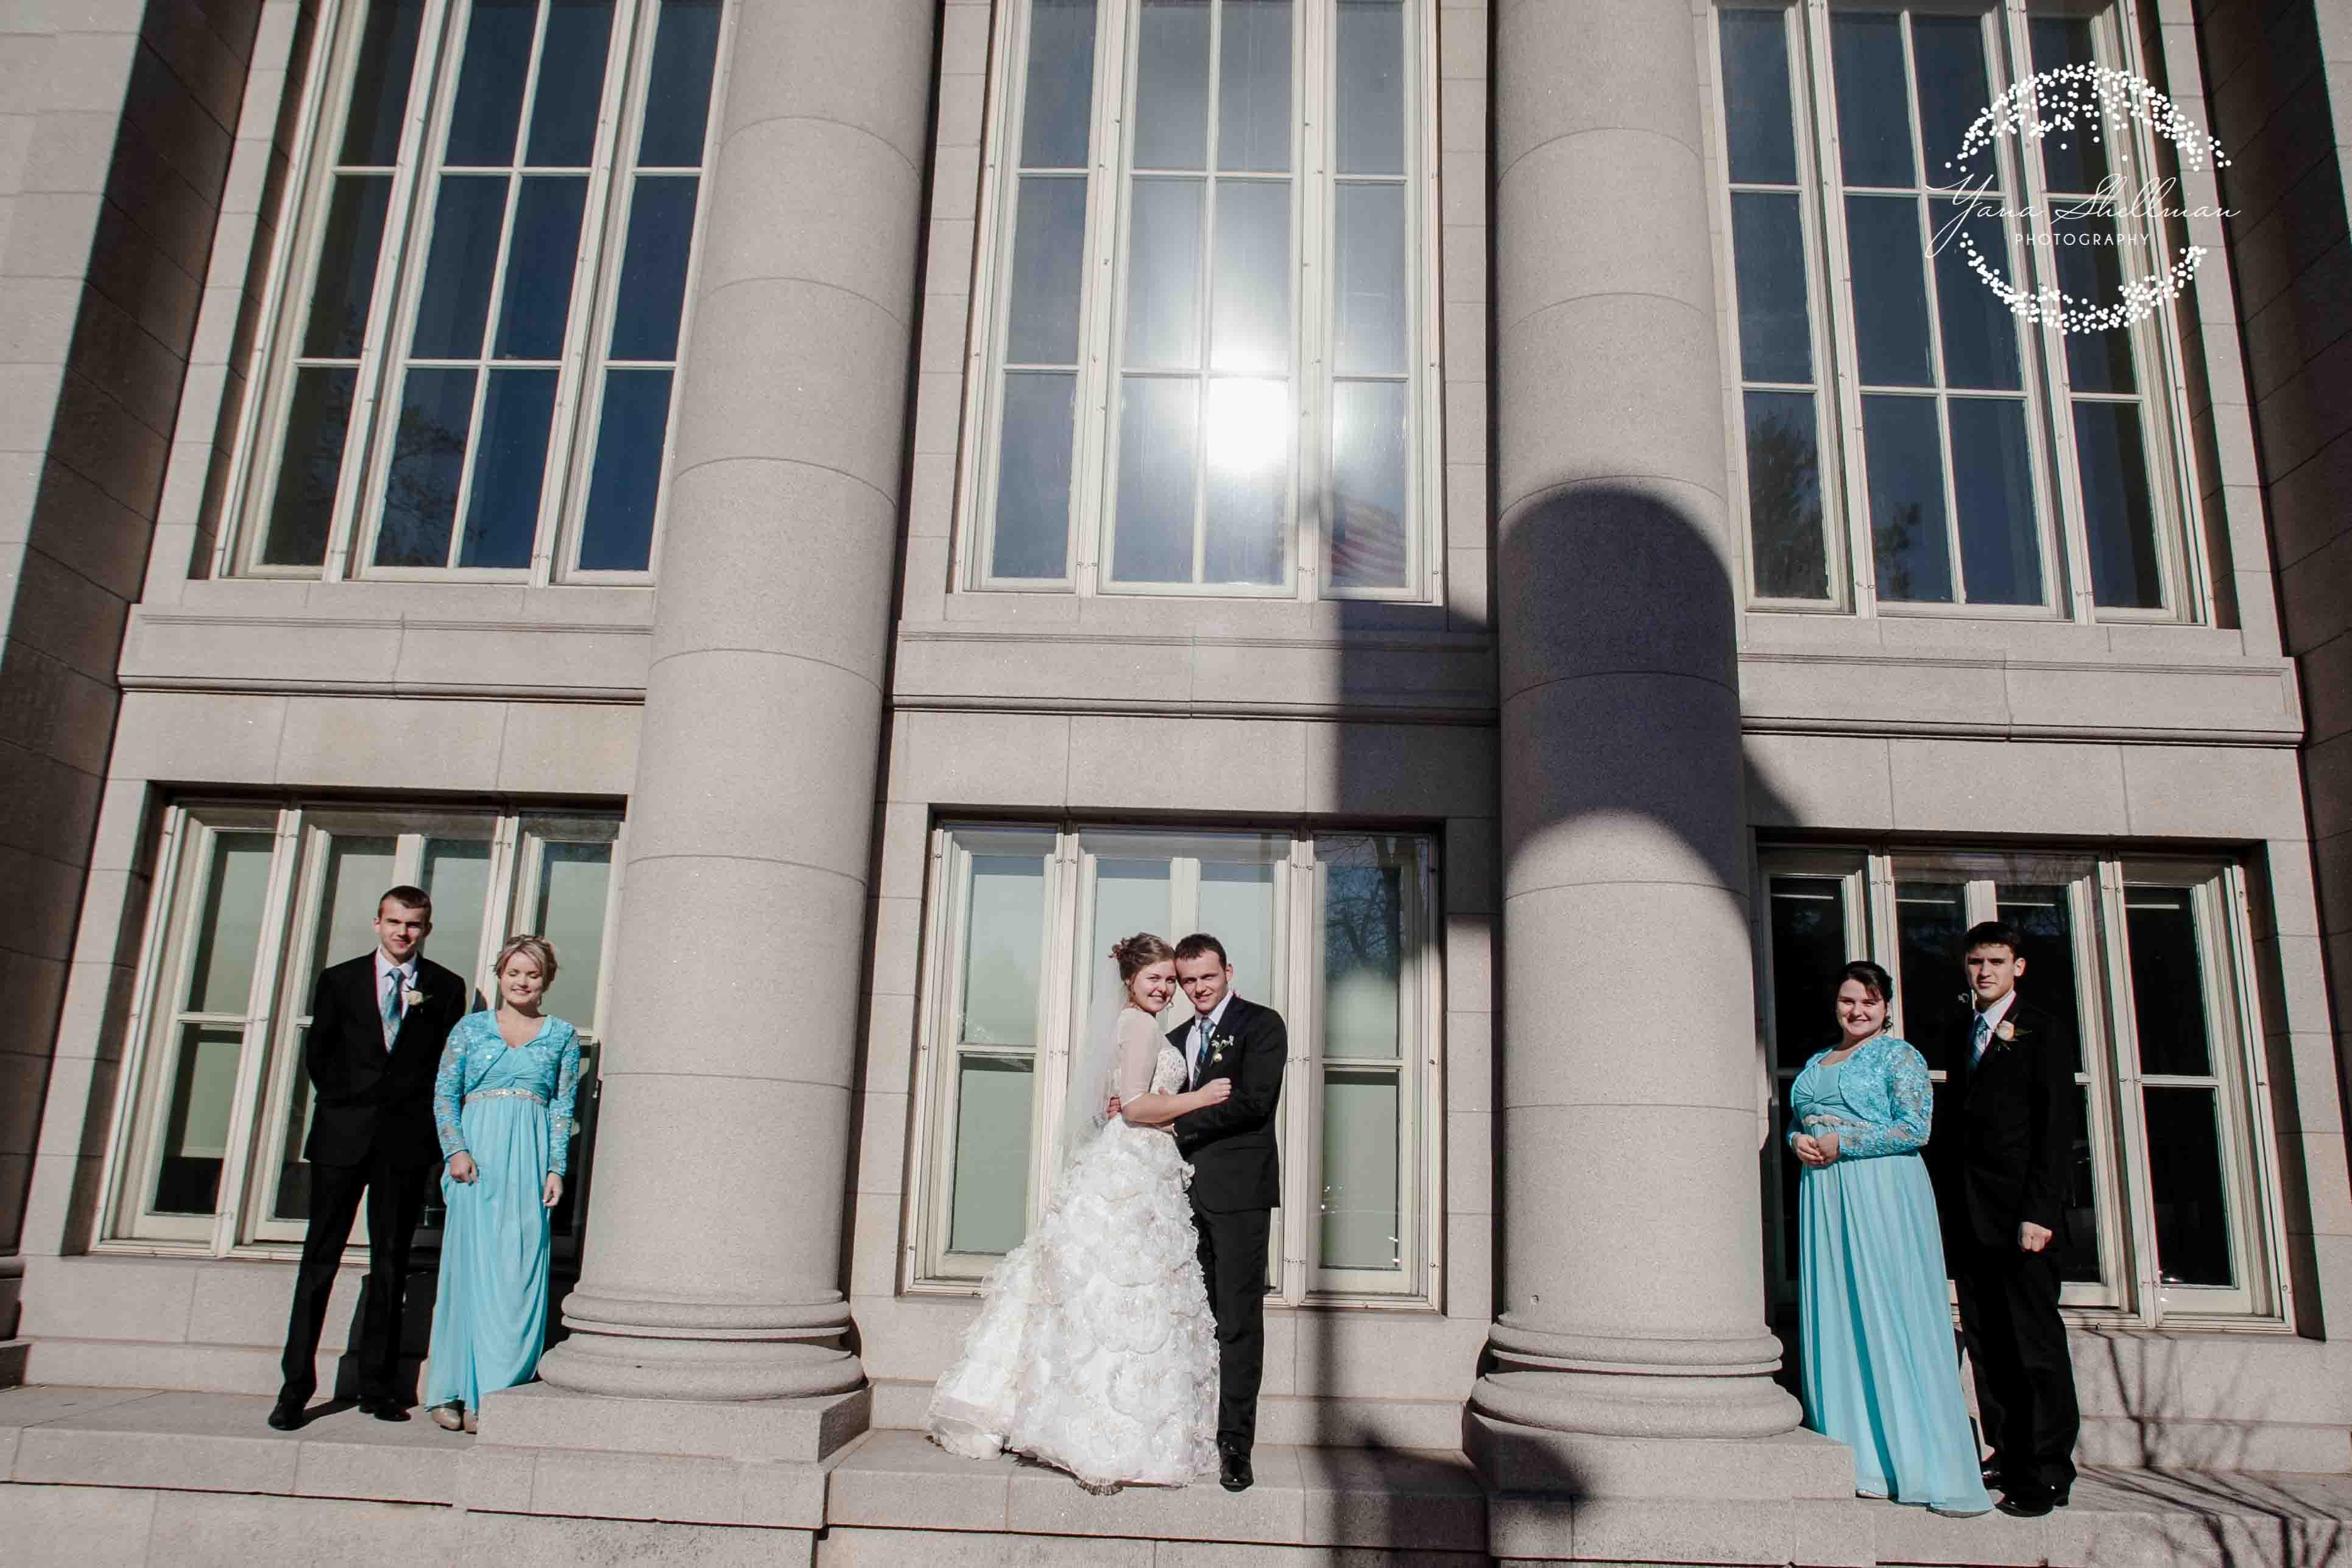 Philadelphia wedding - bride and groom in the winter wonderland- NJ+Philadelphia Wedding Photographer - Yana Shellman Photography